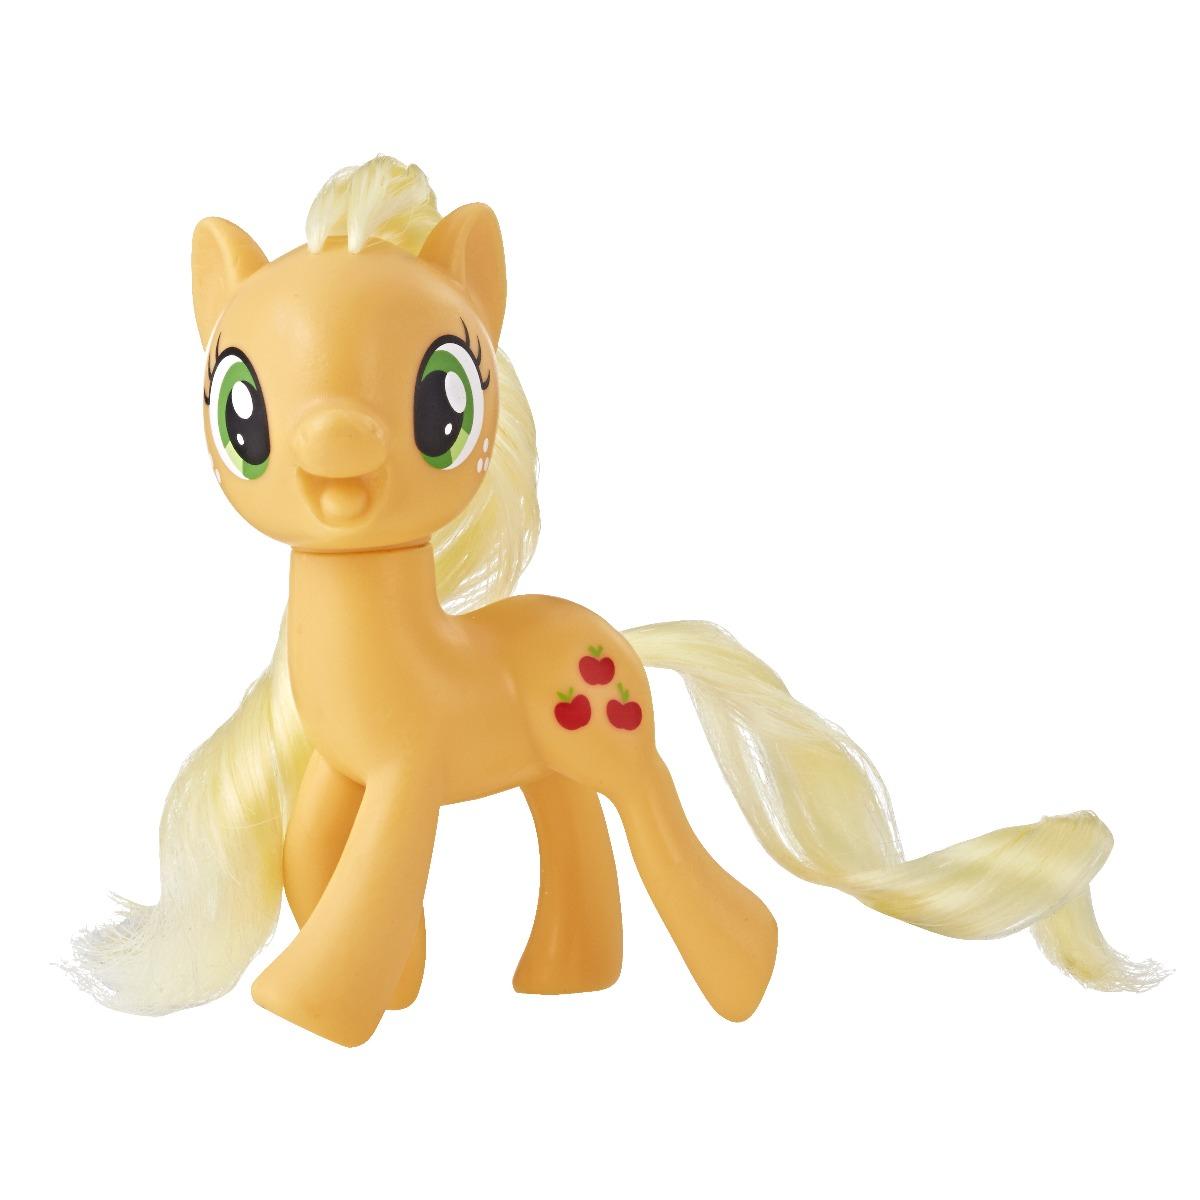 Figurina My Little Pony - Applejack, E5007